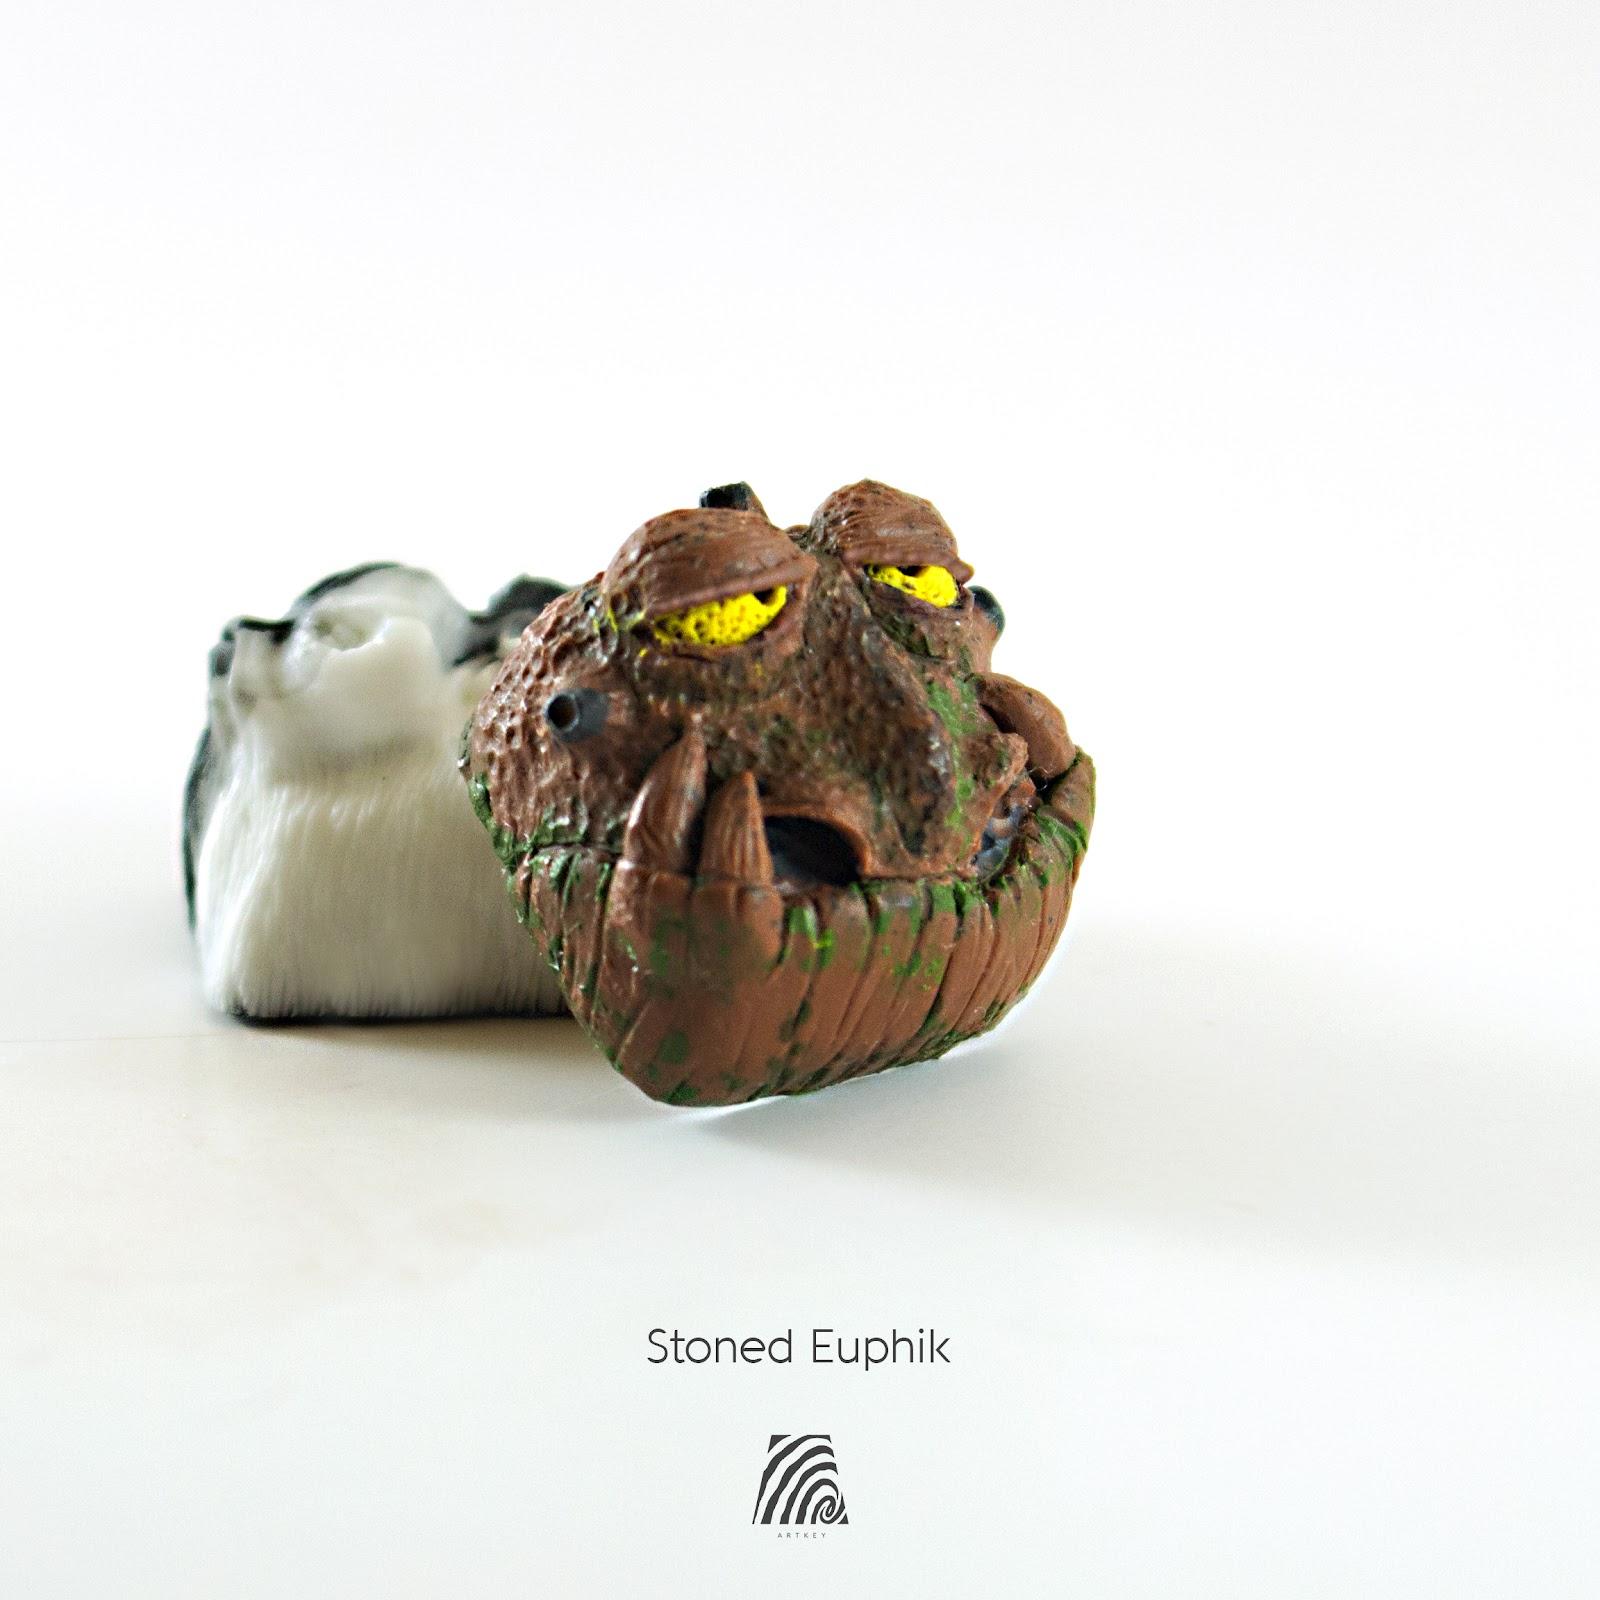 Artkey - Stoned Euphik